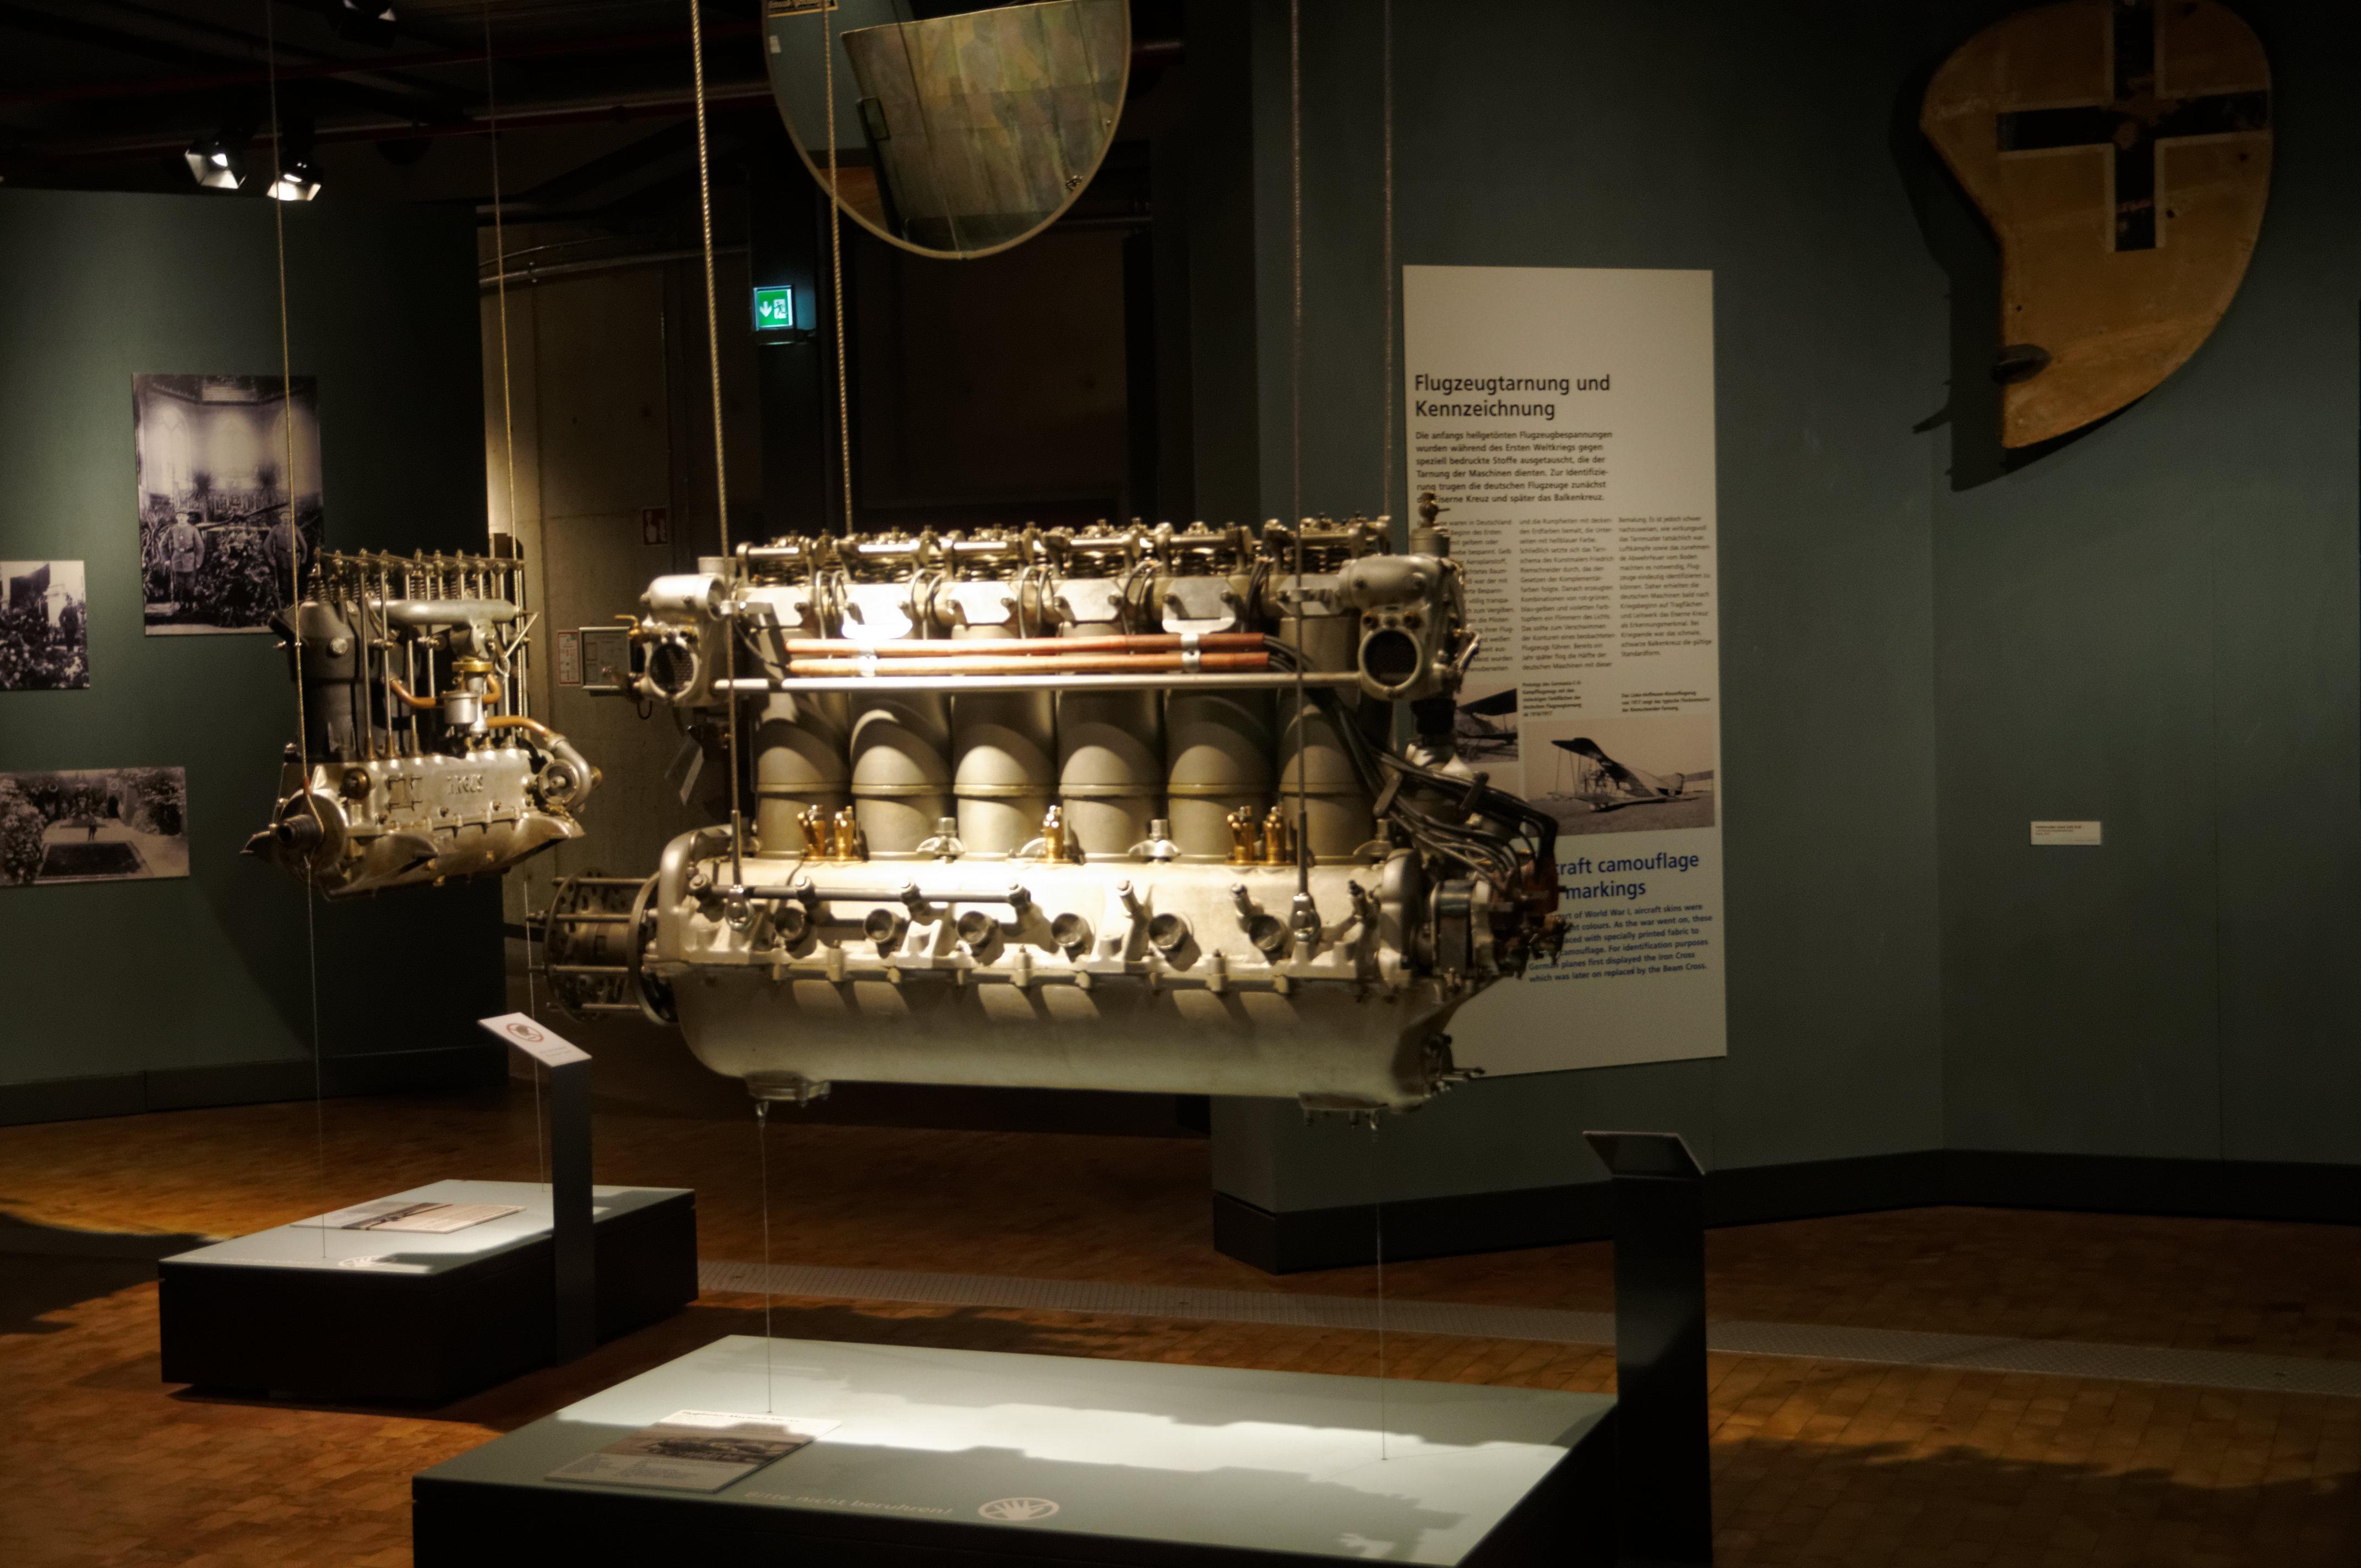 File:Berlin -German Museum of Technology- 2014 by-RaBoe 55 jpg